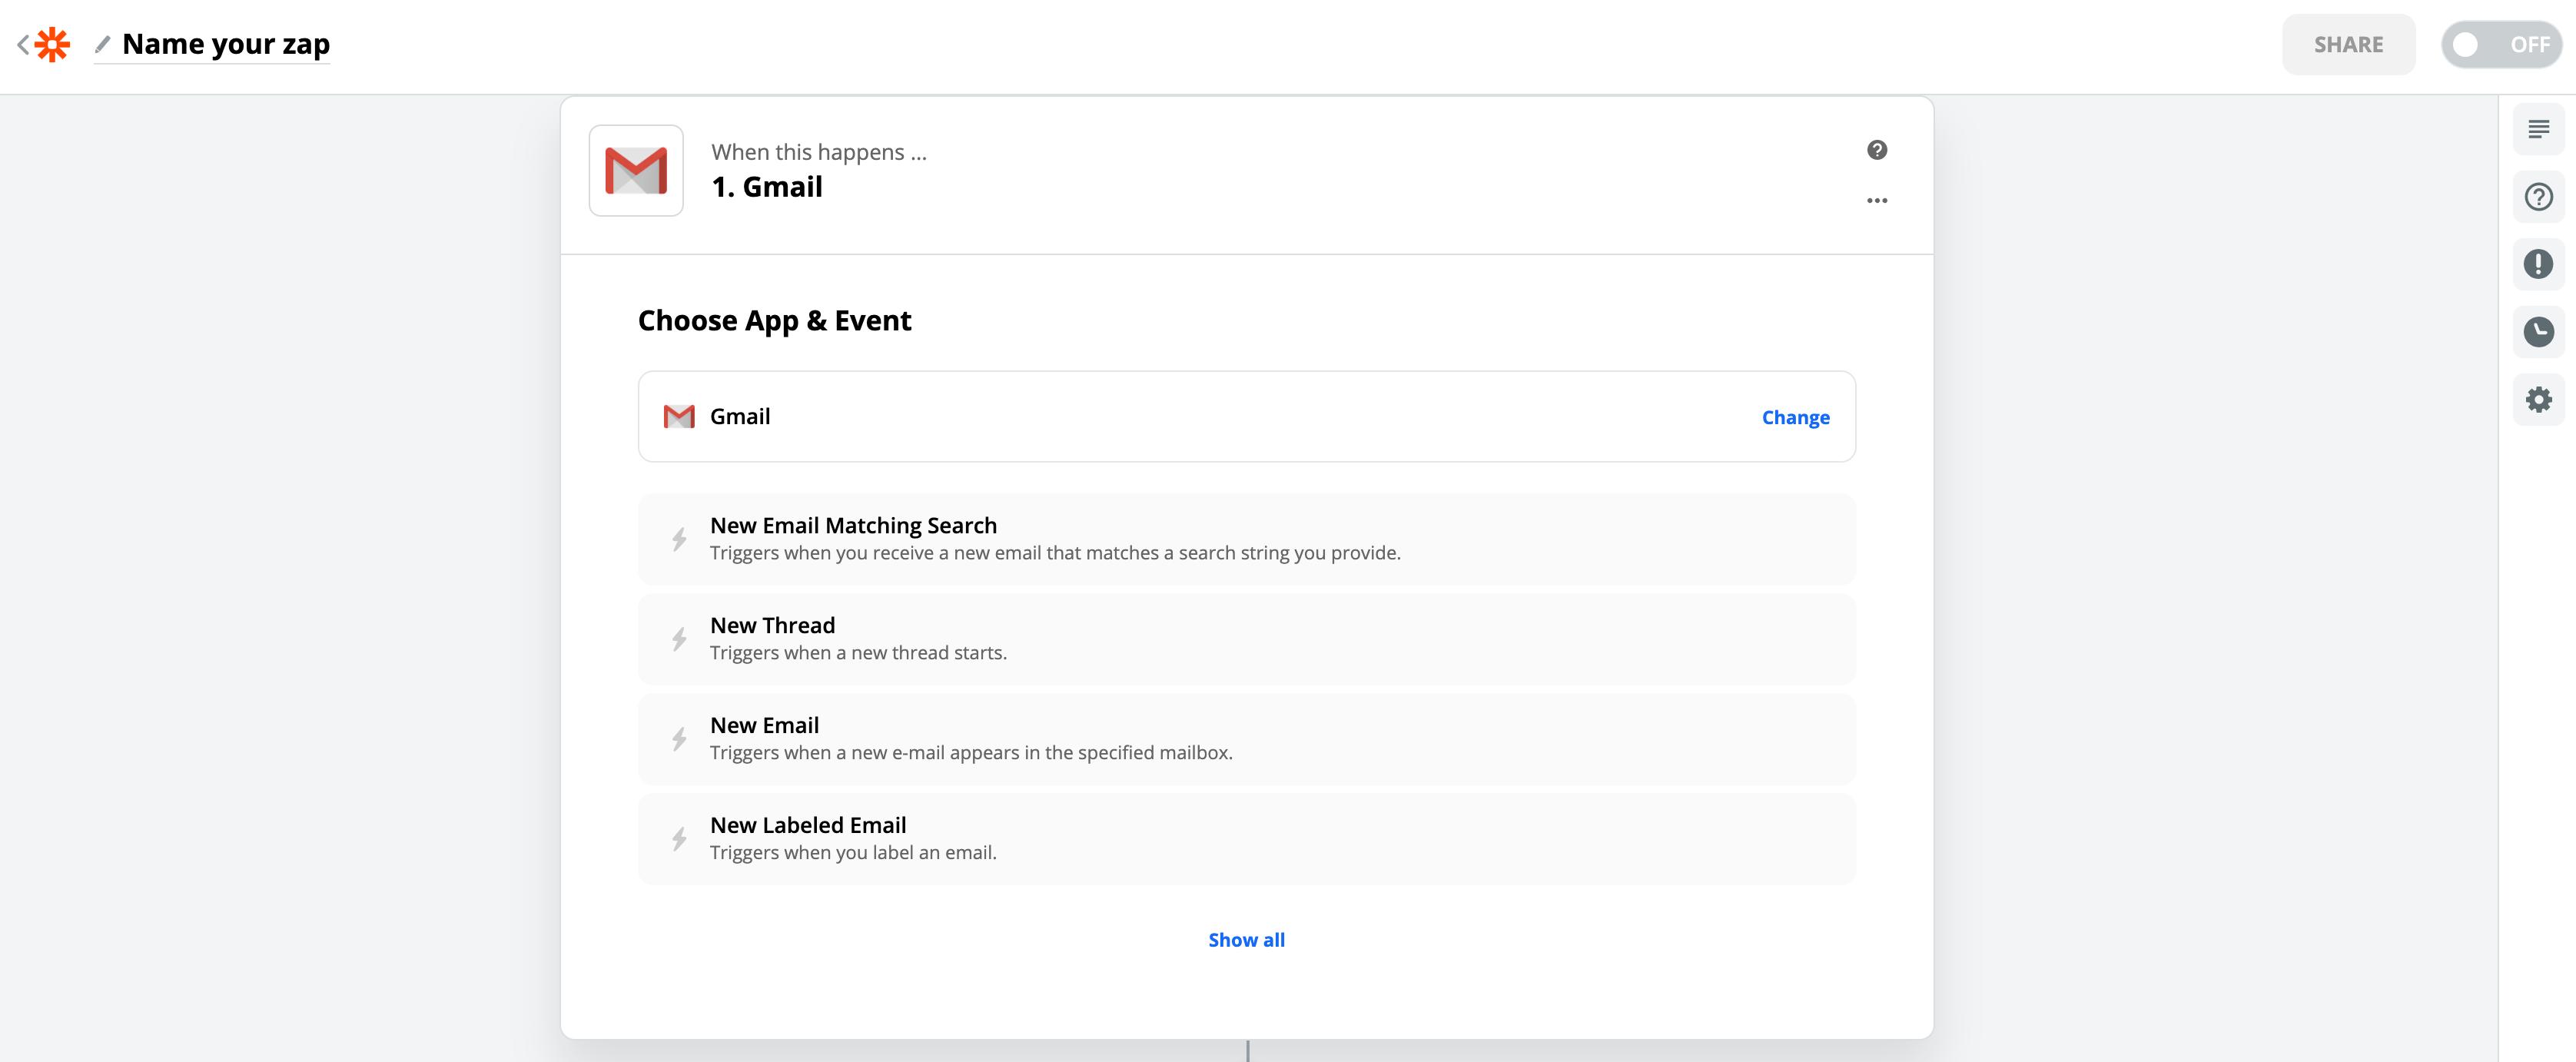 GmailのZapierの設定画像